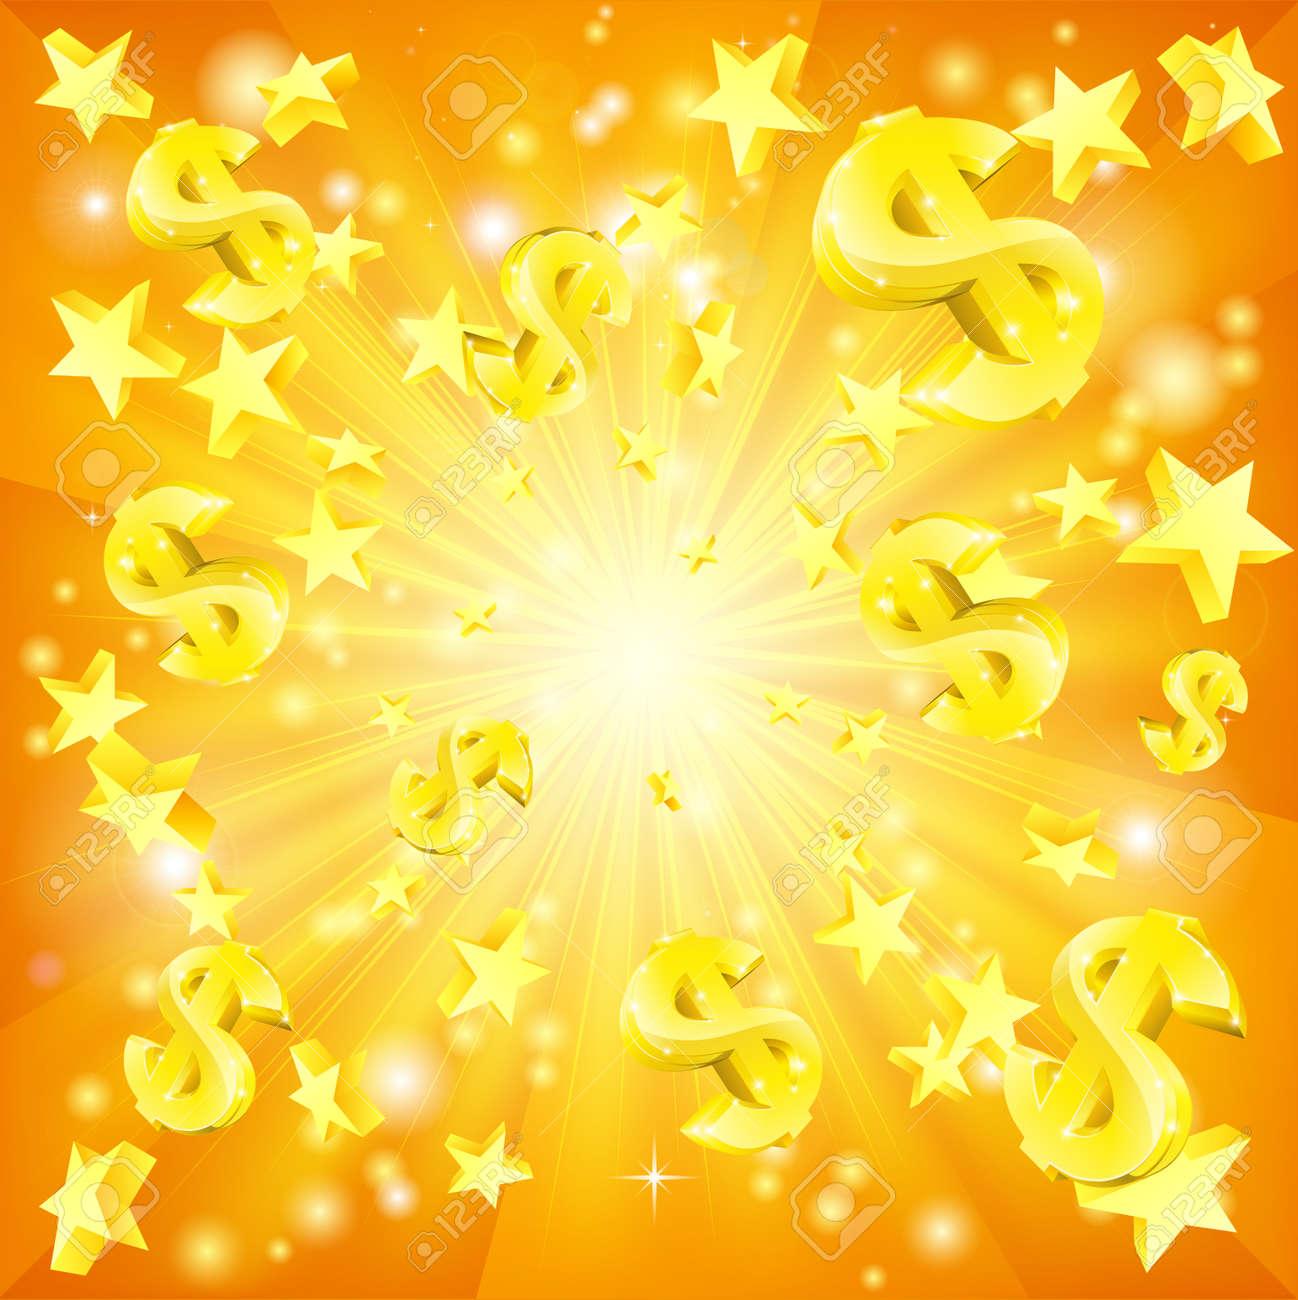 Dollar jackpot money and stars background - 54229215